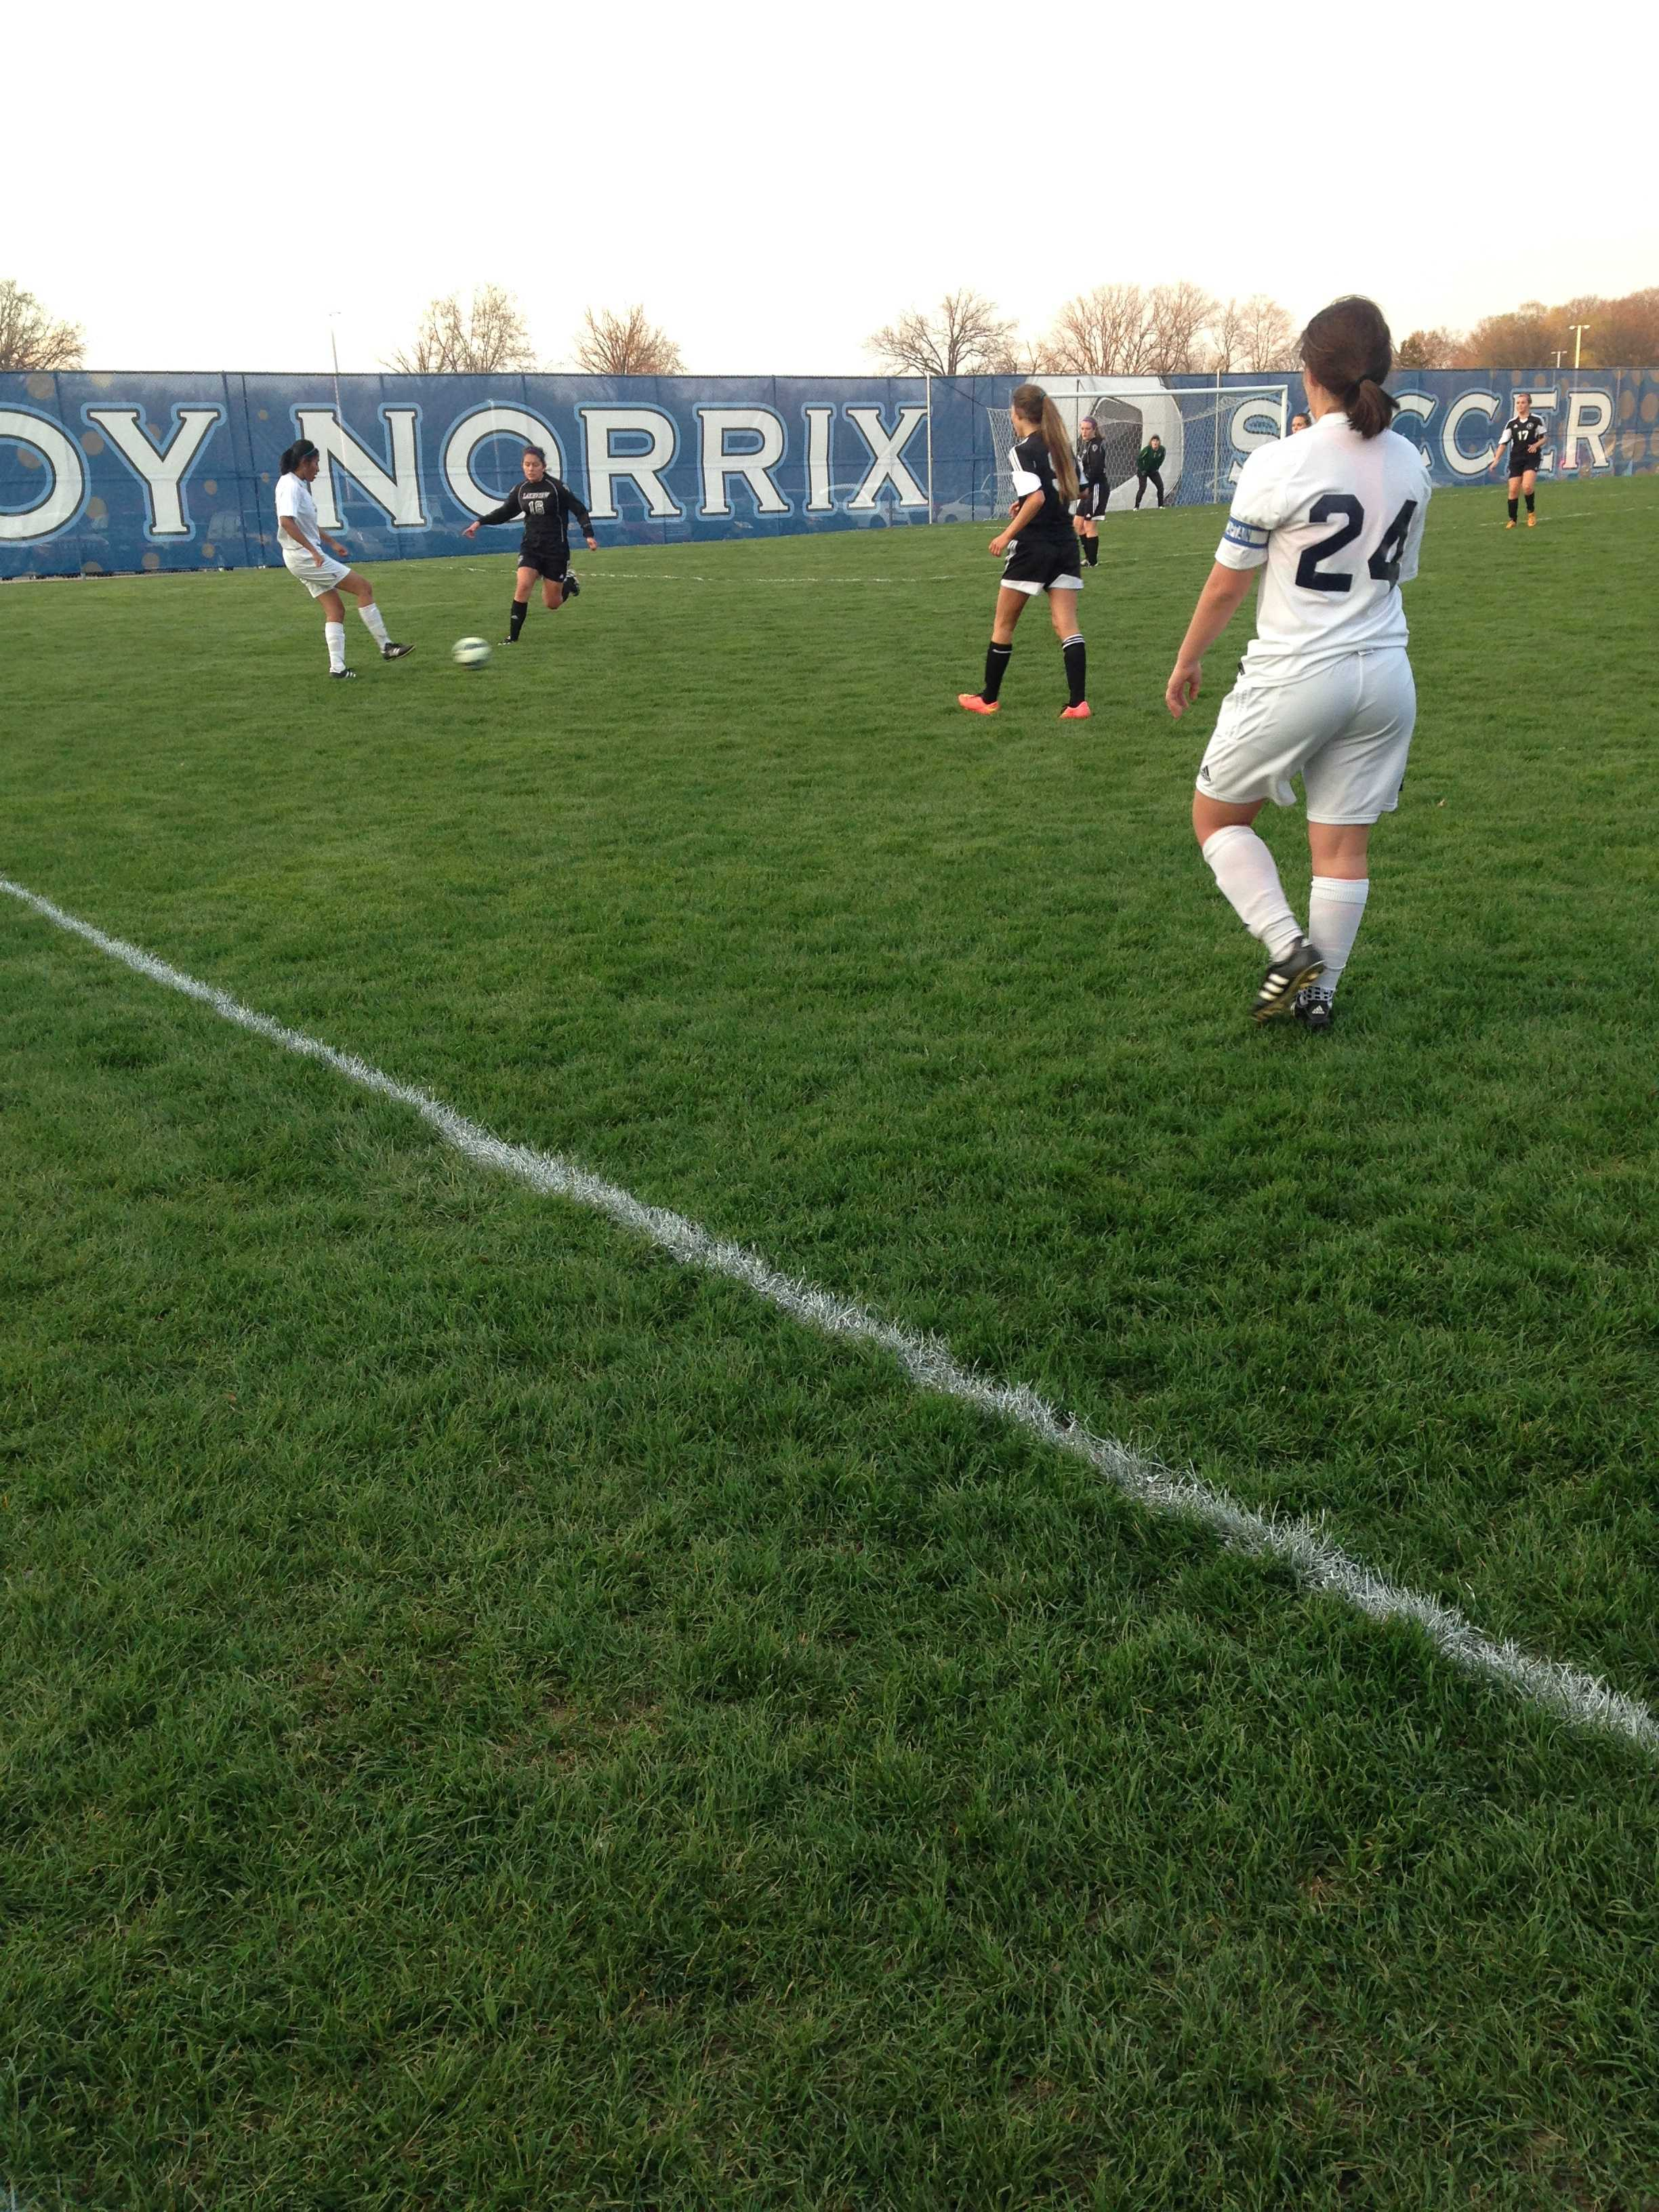 Julie Zabik and Lena Wood play against Battle Creek Lake view, they were victorious 3-0. Photo Credit / Ashtyn Kenbeek